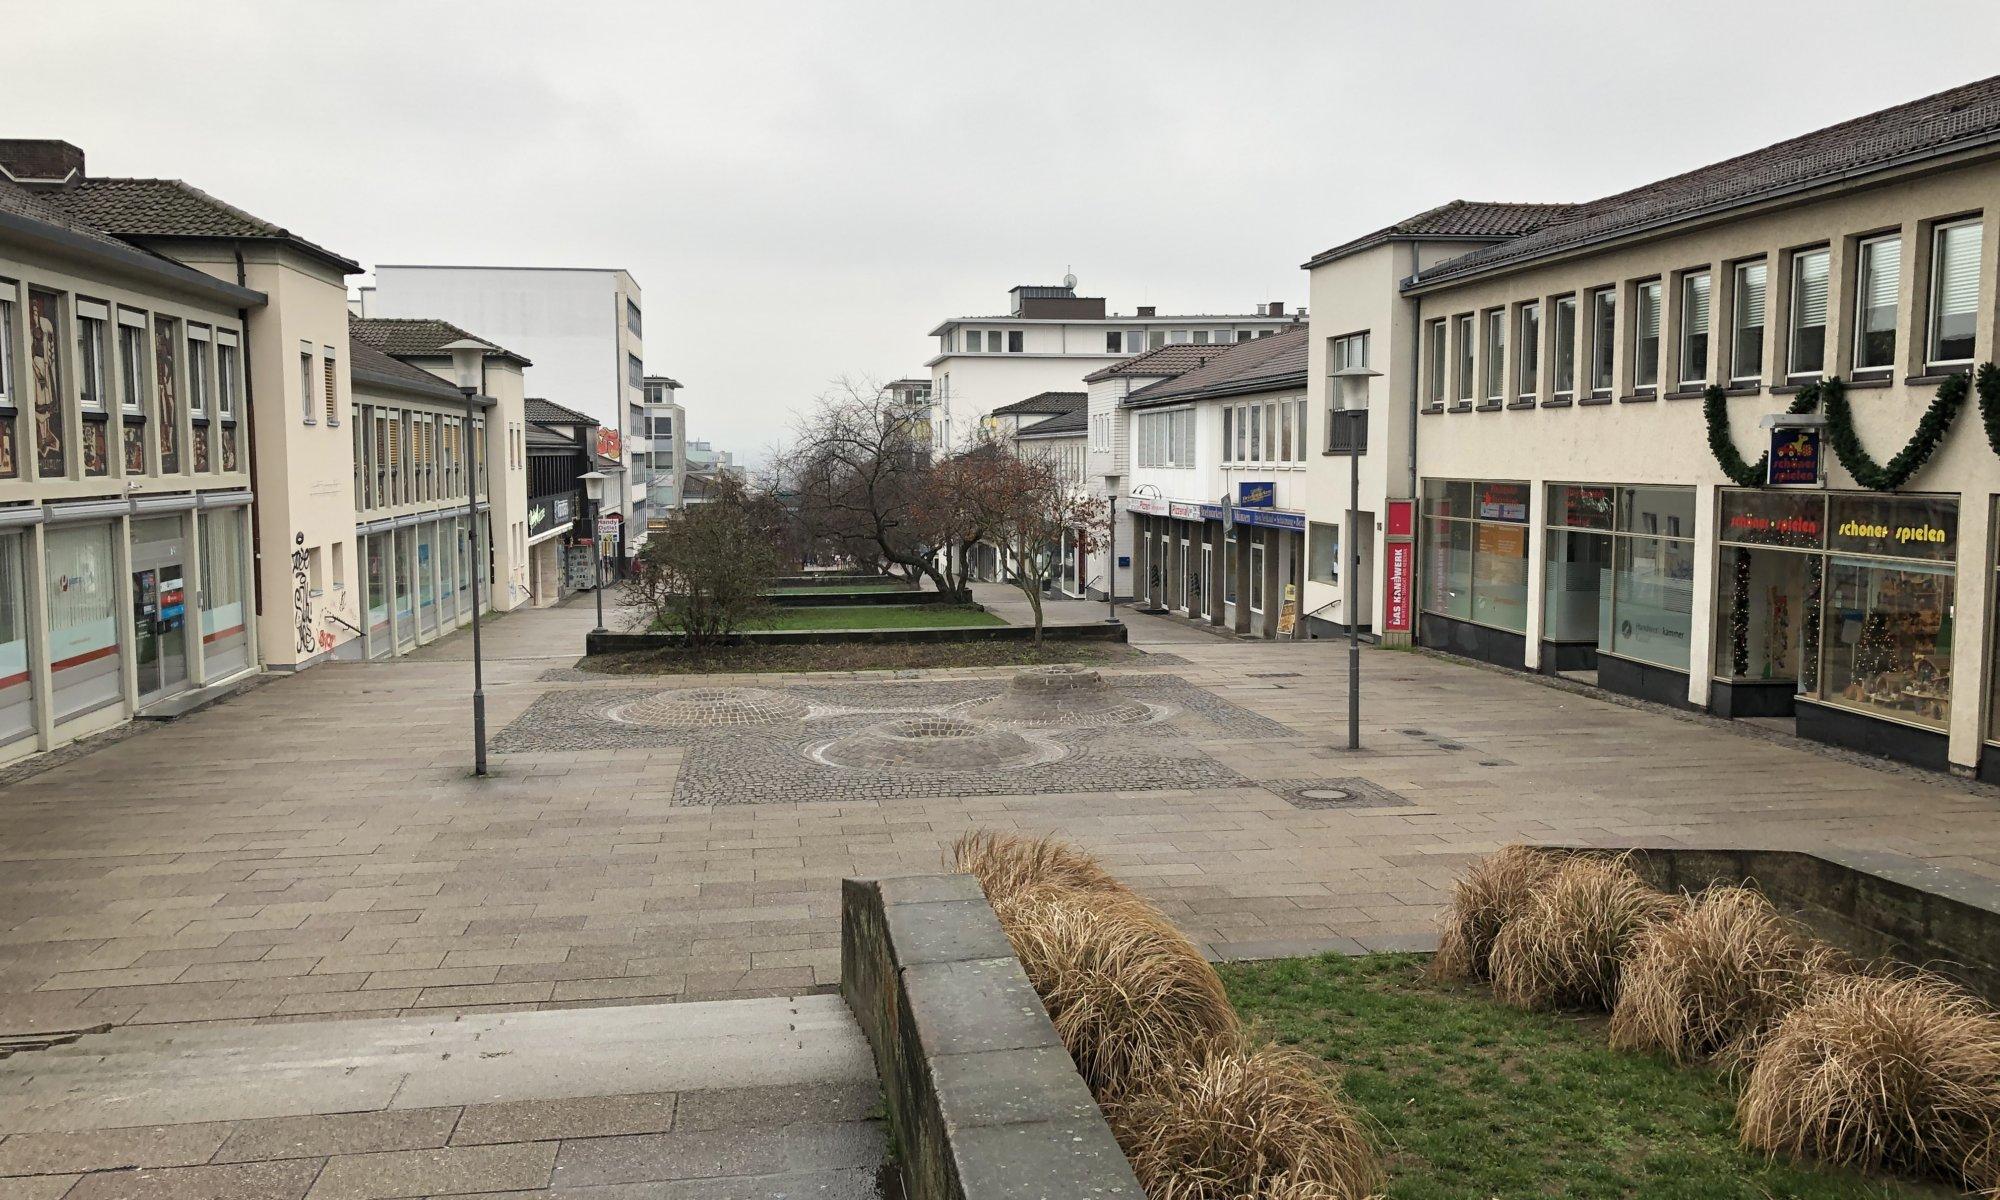 Treppenstraße, Kassel